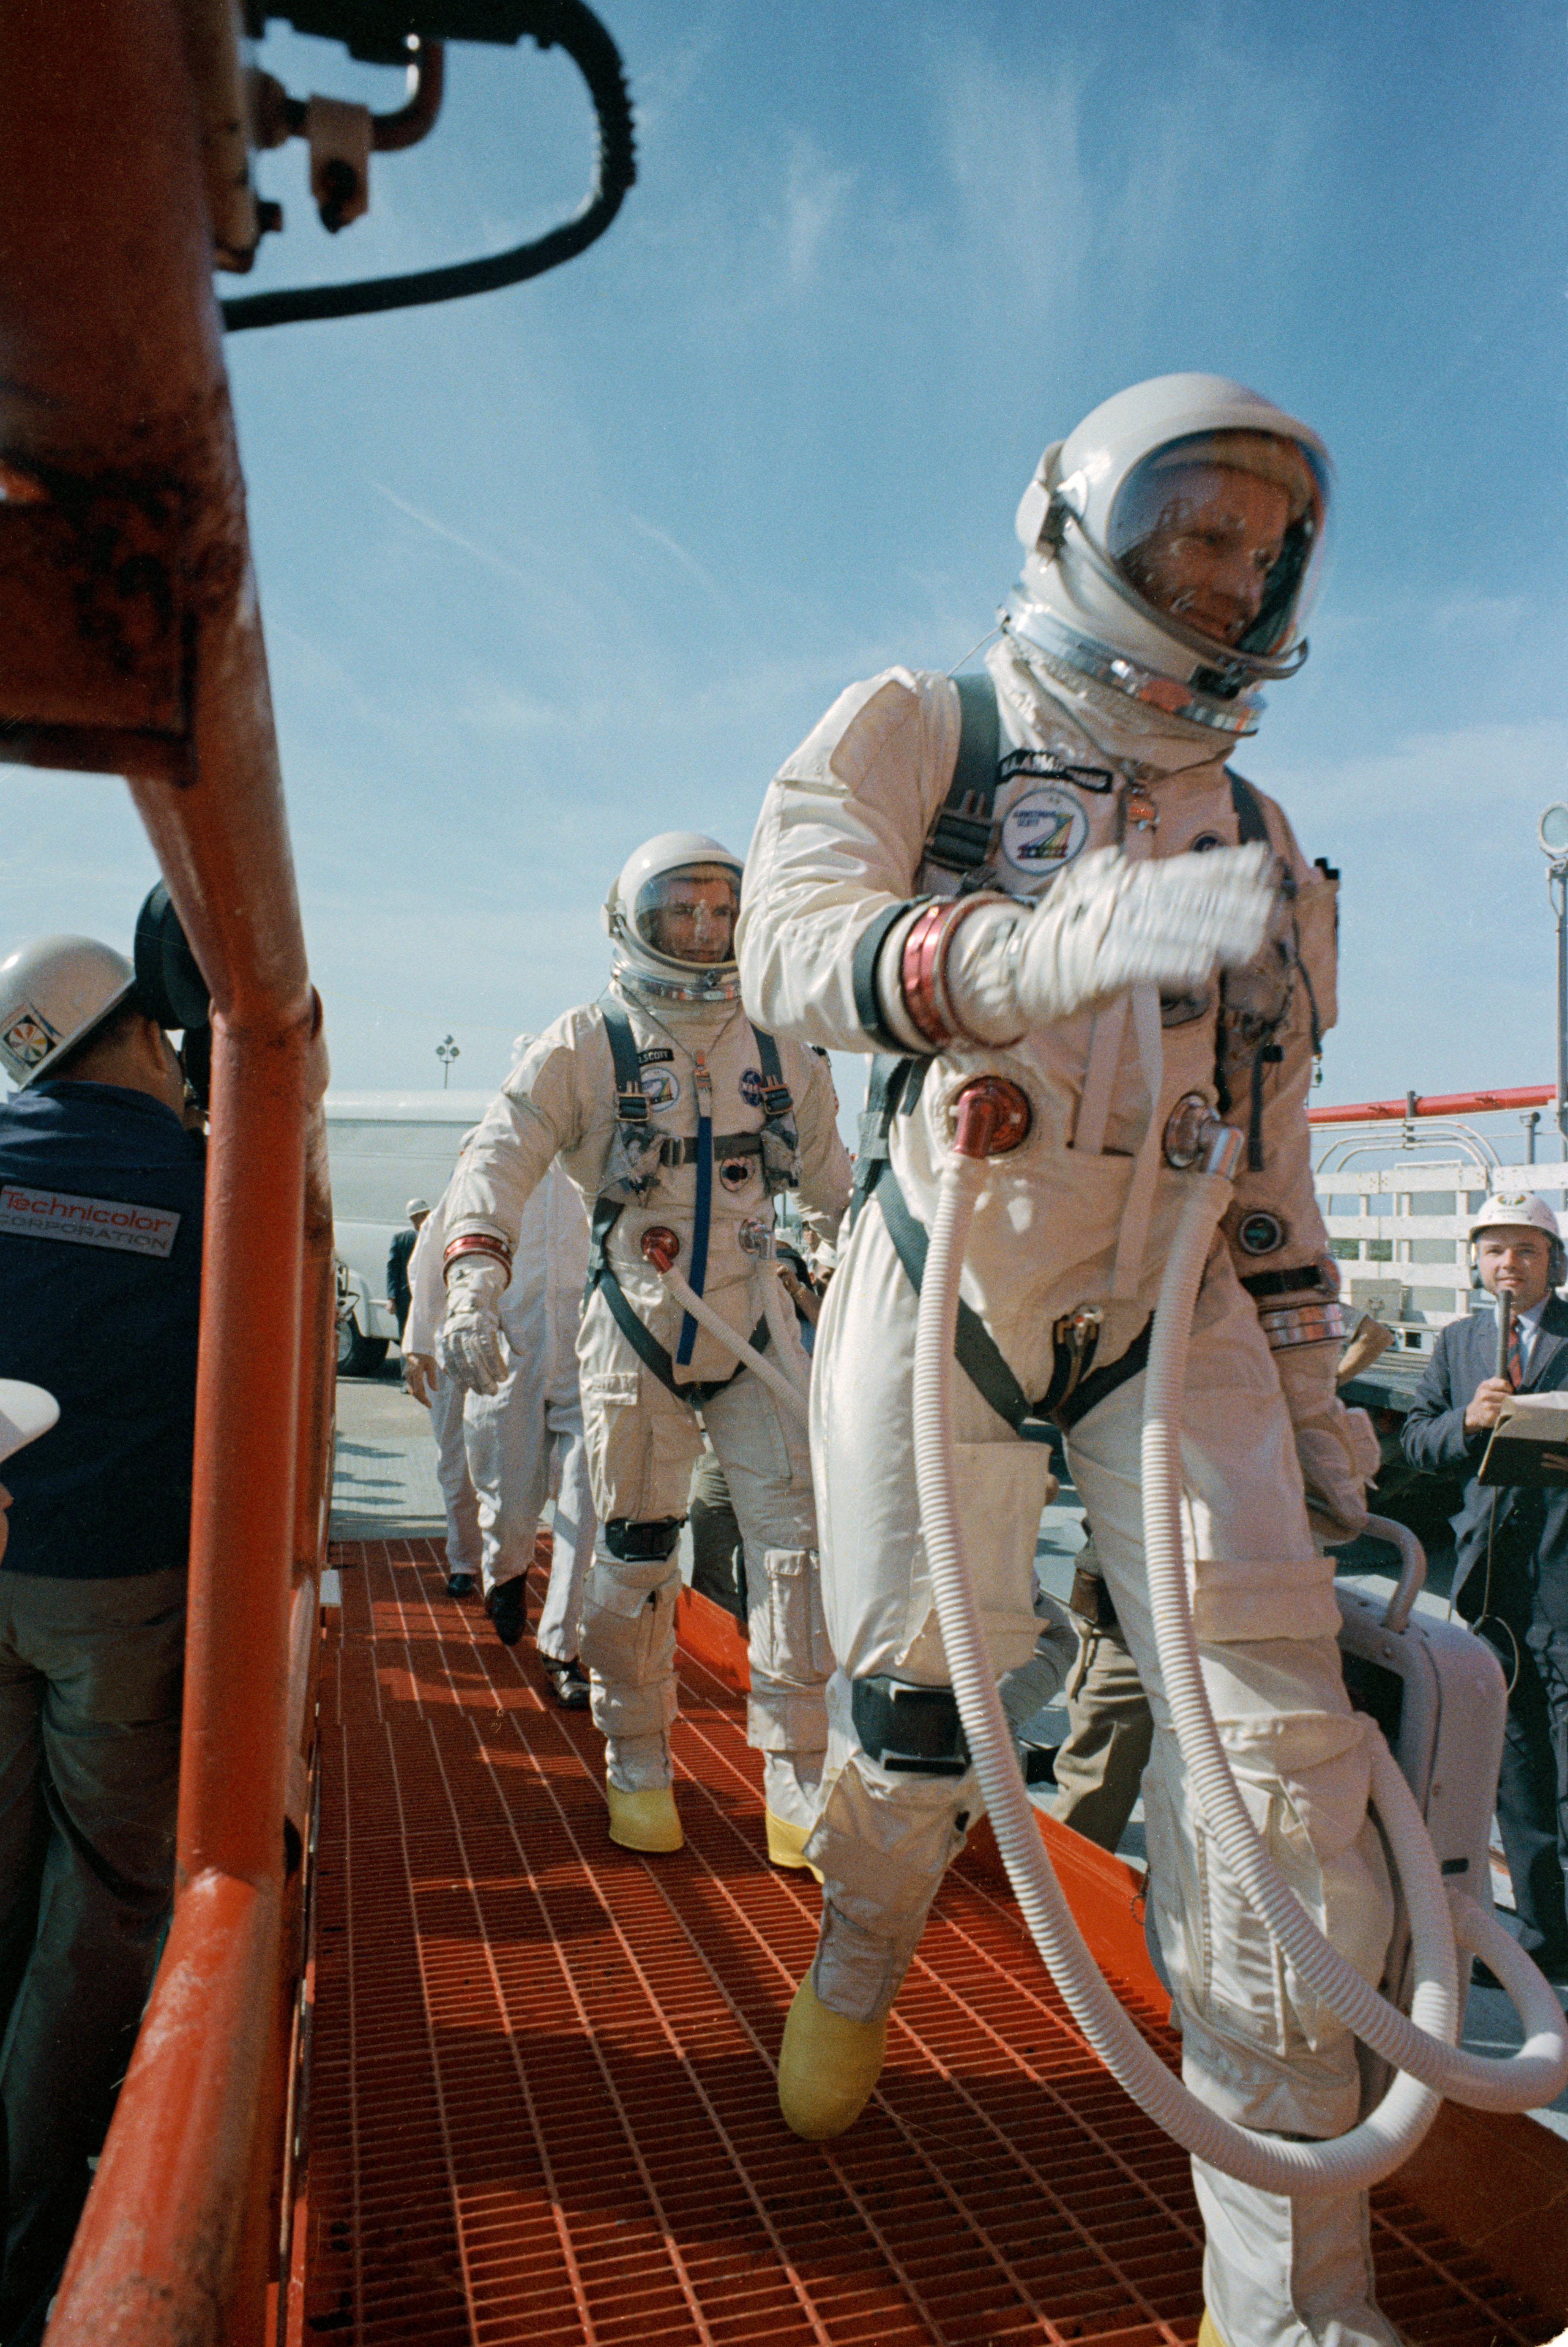 Boarding Gemini VIII | NASA